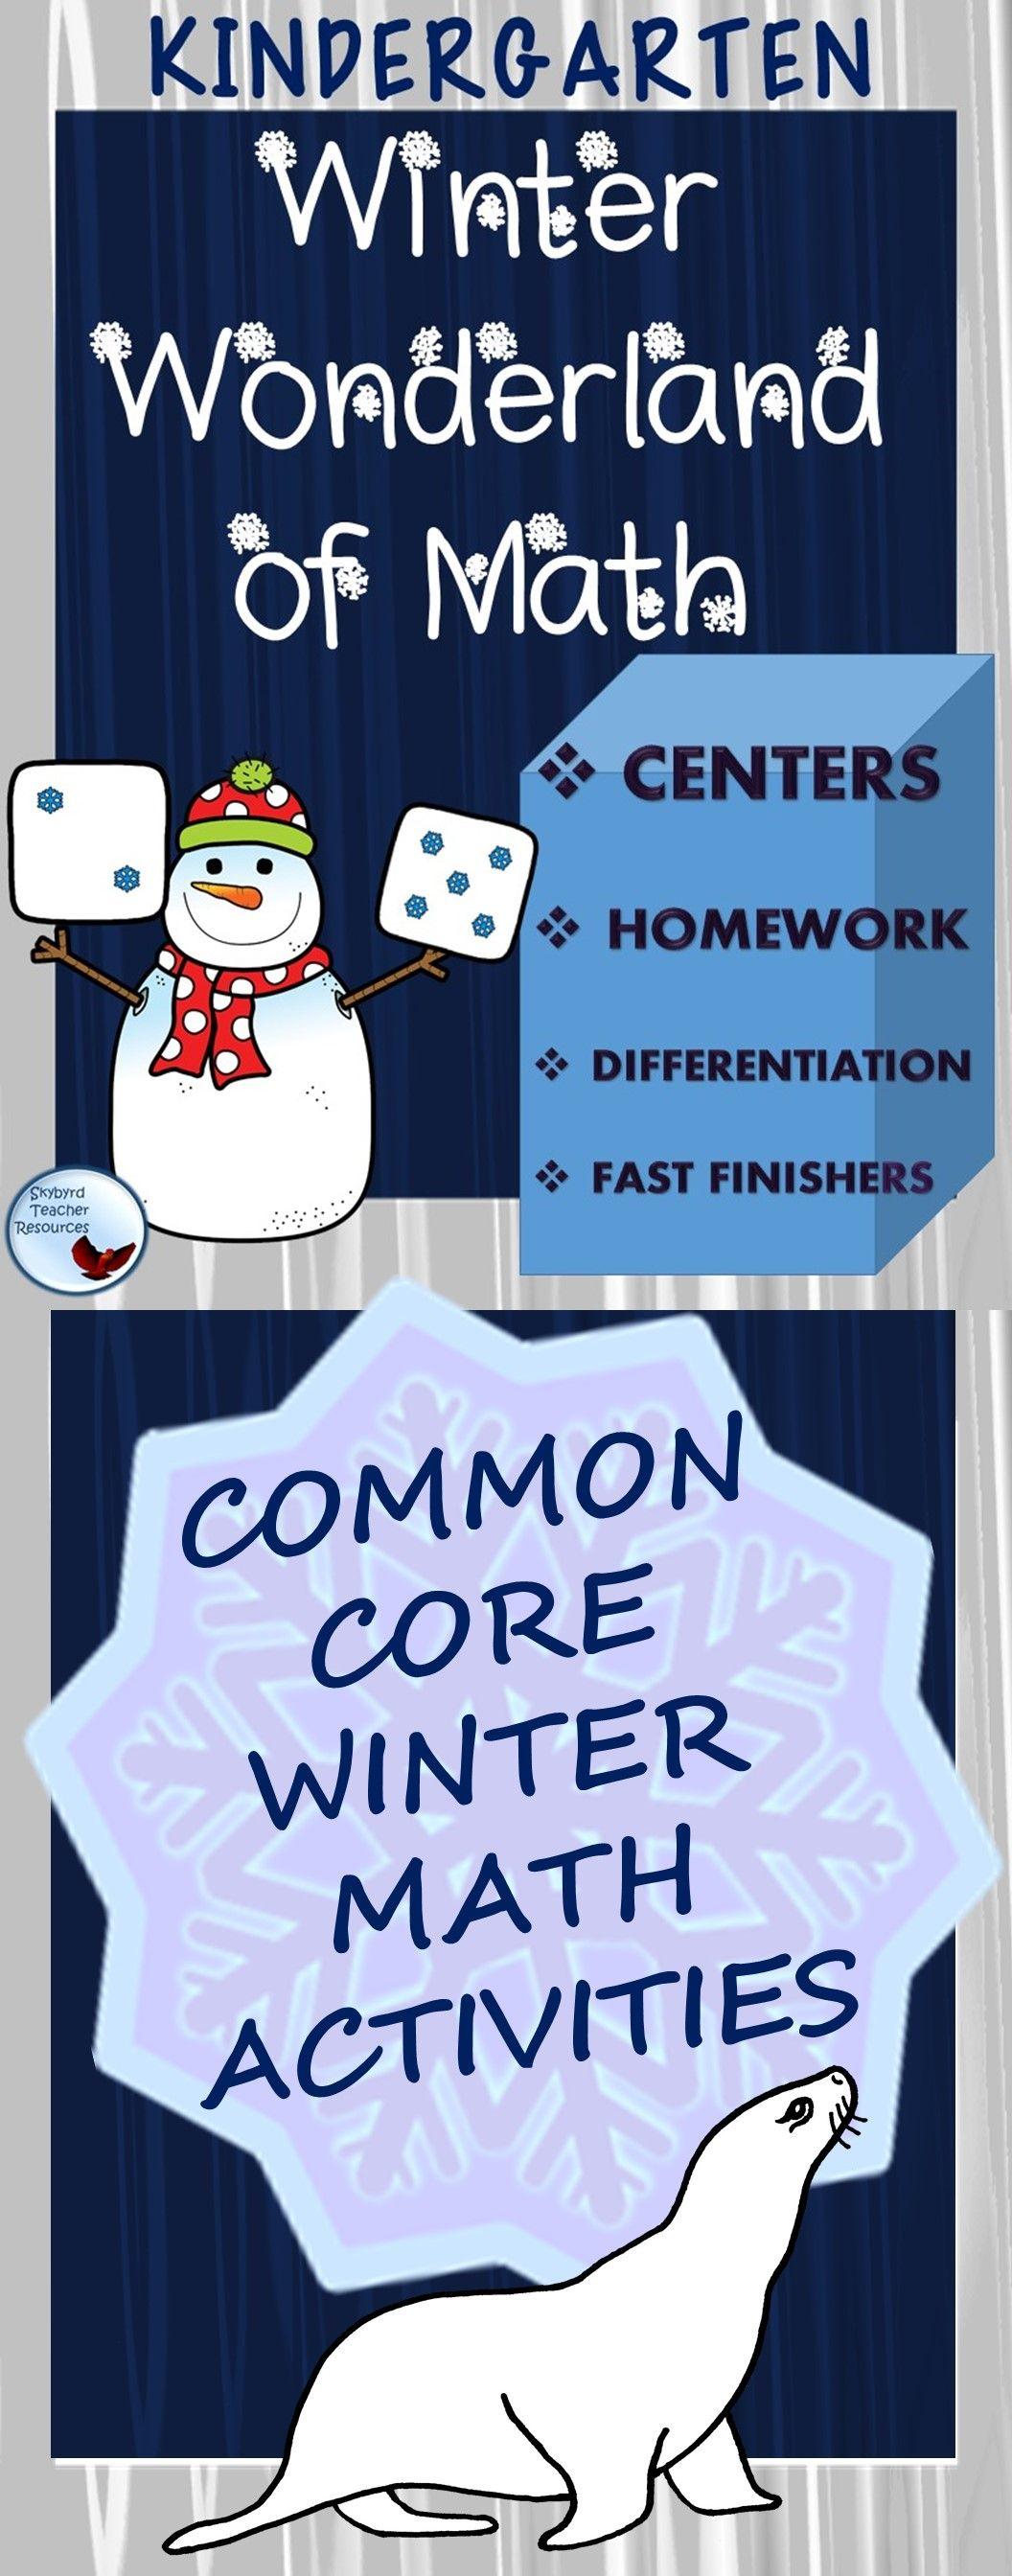 Math Kindergarten Winter Wonderland Math Activities And